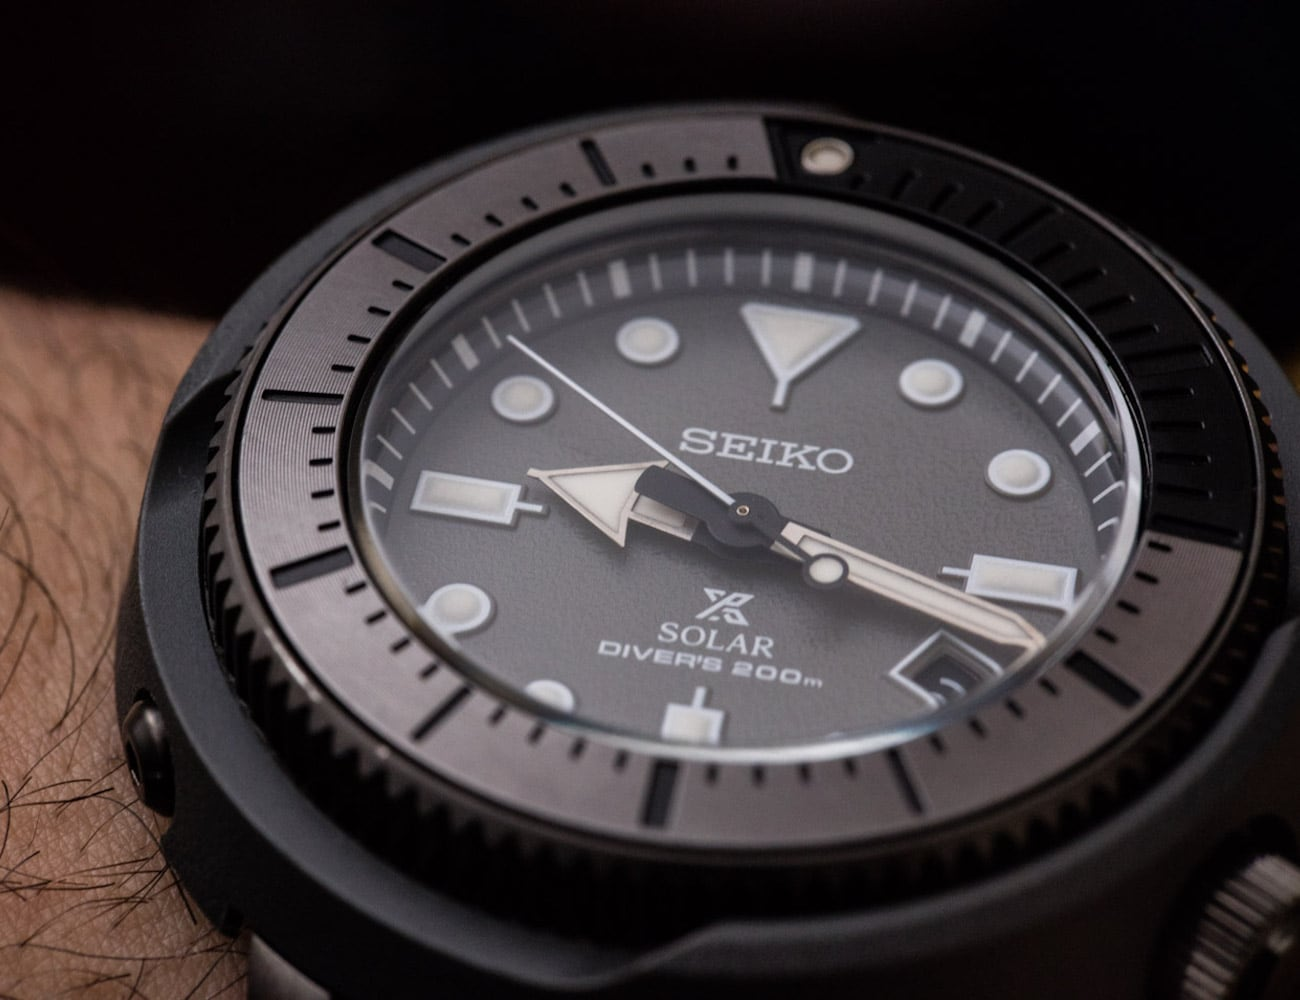 6d1e84962284 Seiko Prospex Street Series Solar Diver Watches » Gadget Flow